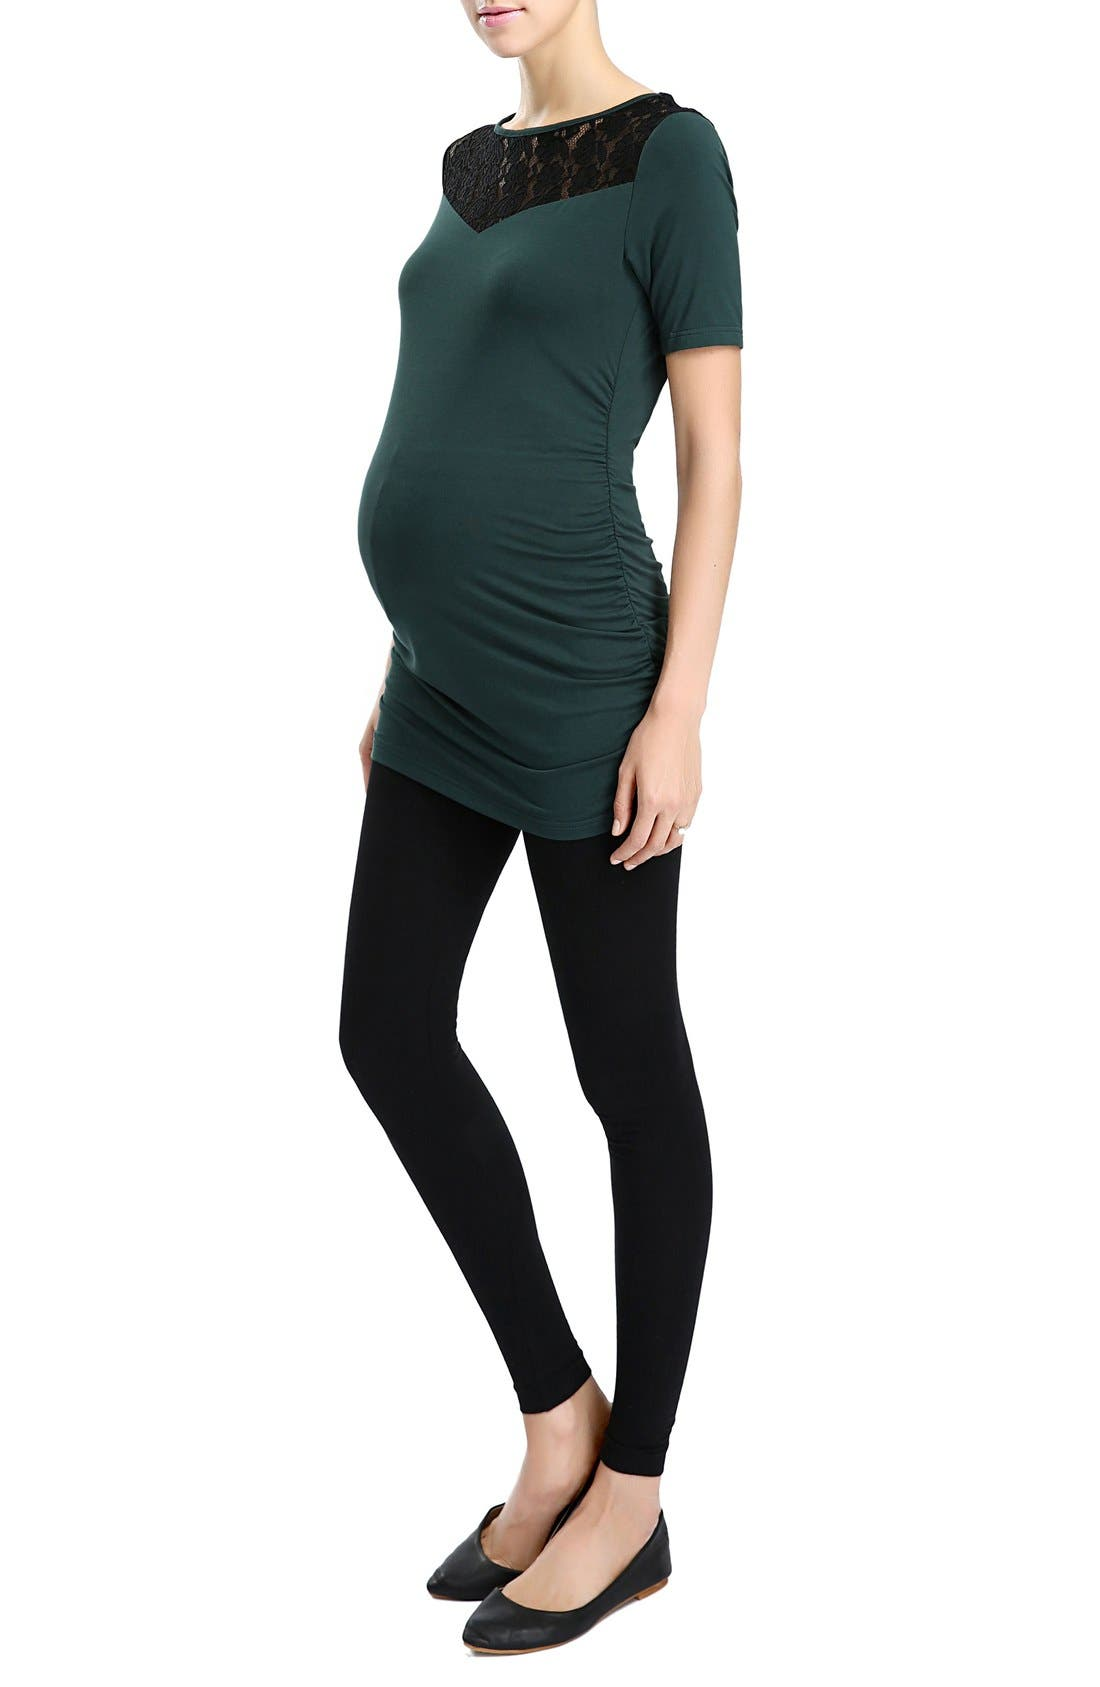 'Alden' Floral Lace Jersey Maternity Top,                             Alternate thumbnail 2, color,                             440